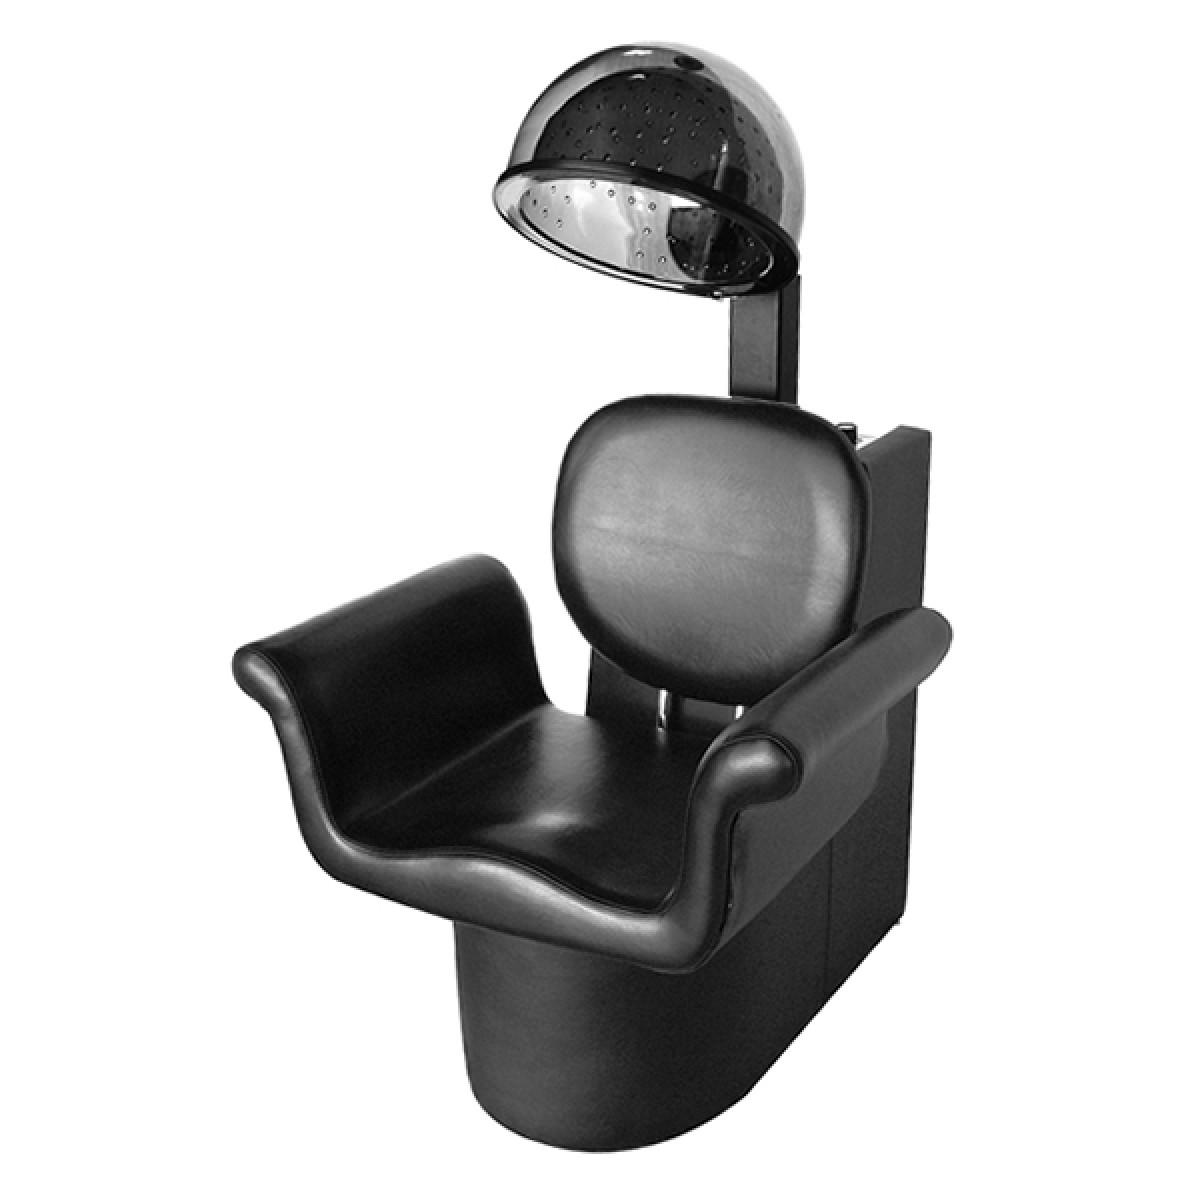 Mantua salon dryer chair - Salon chair with hair dryer ...